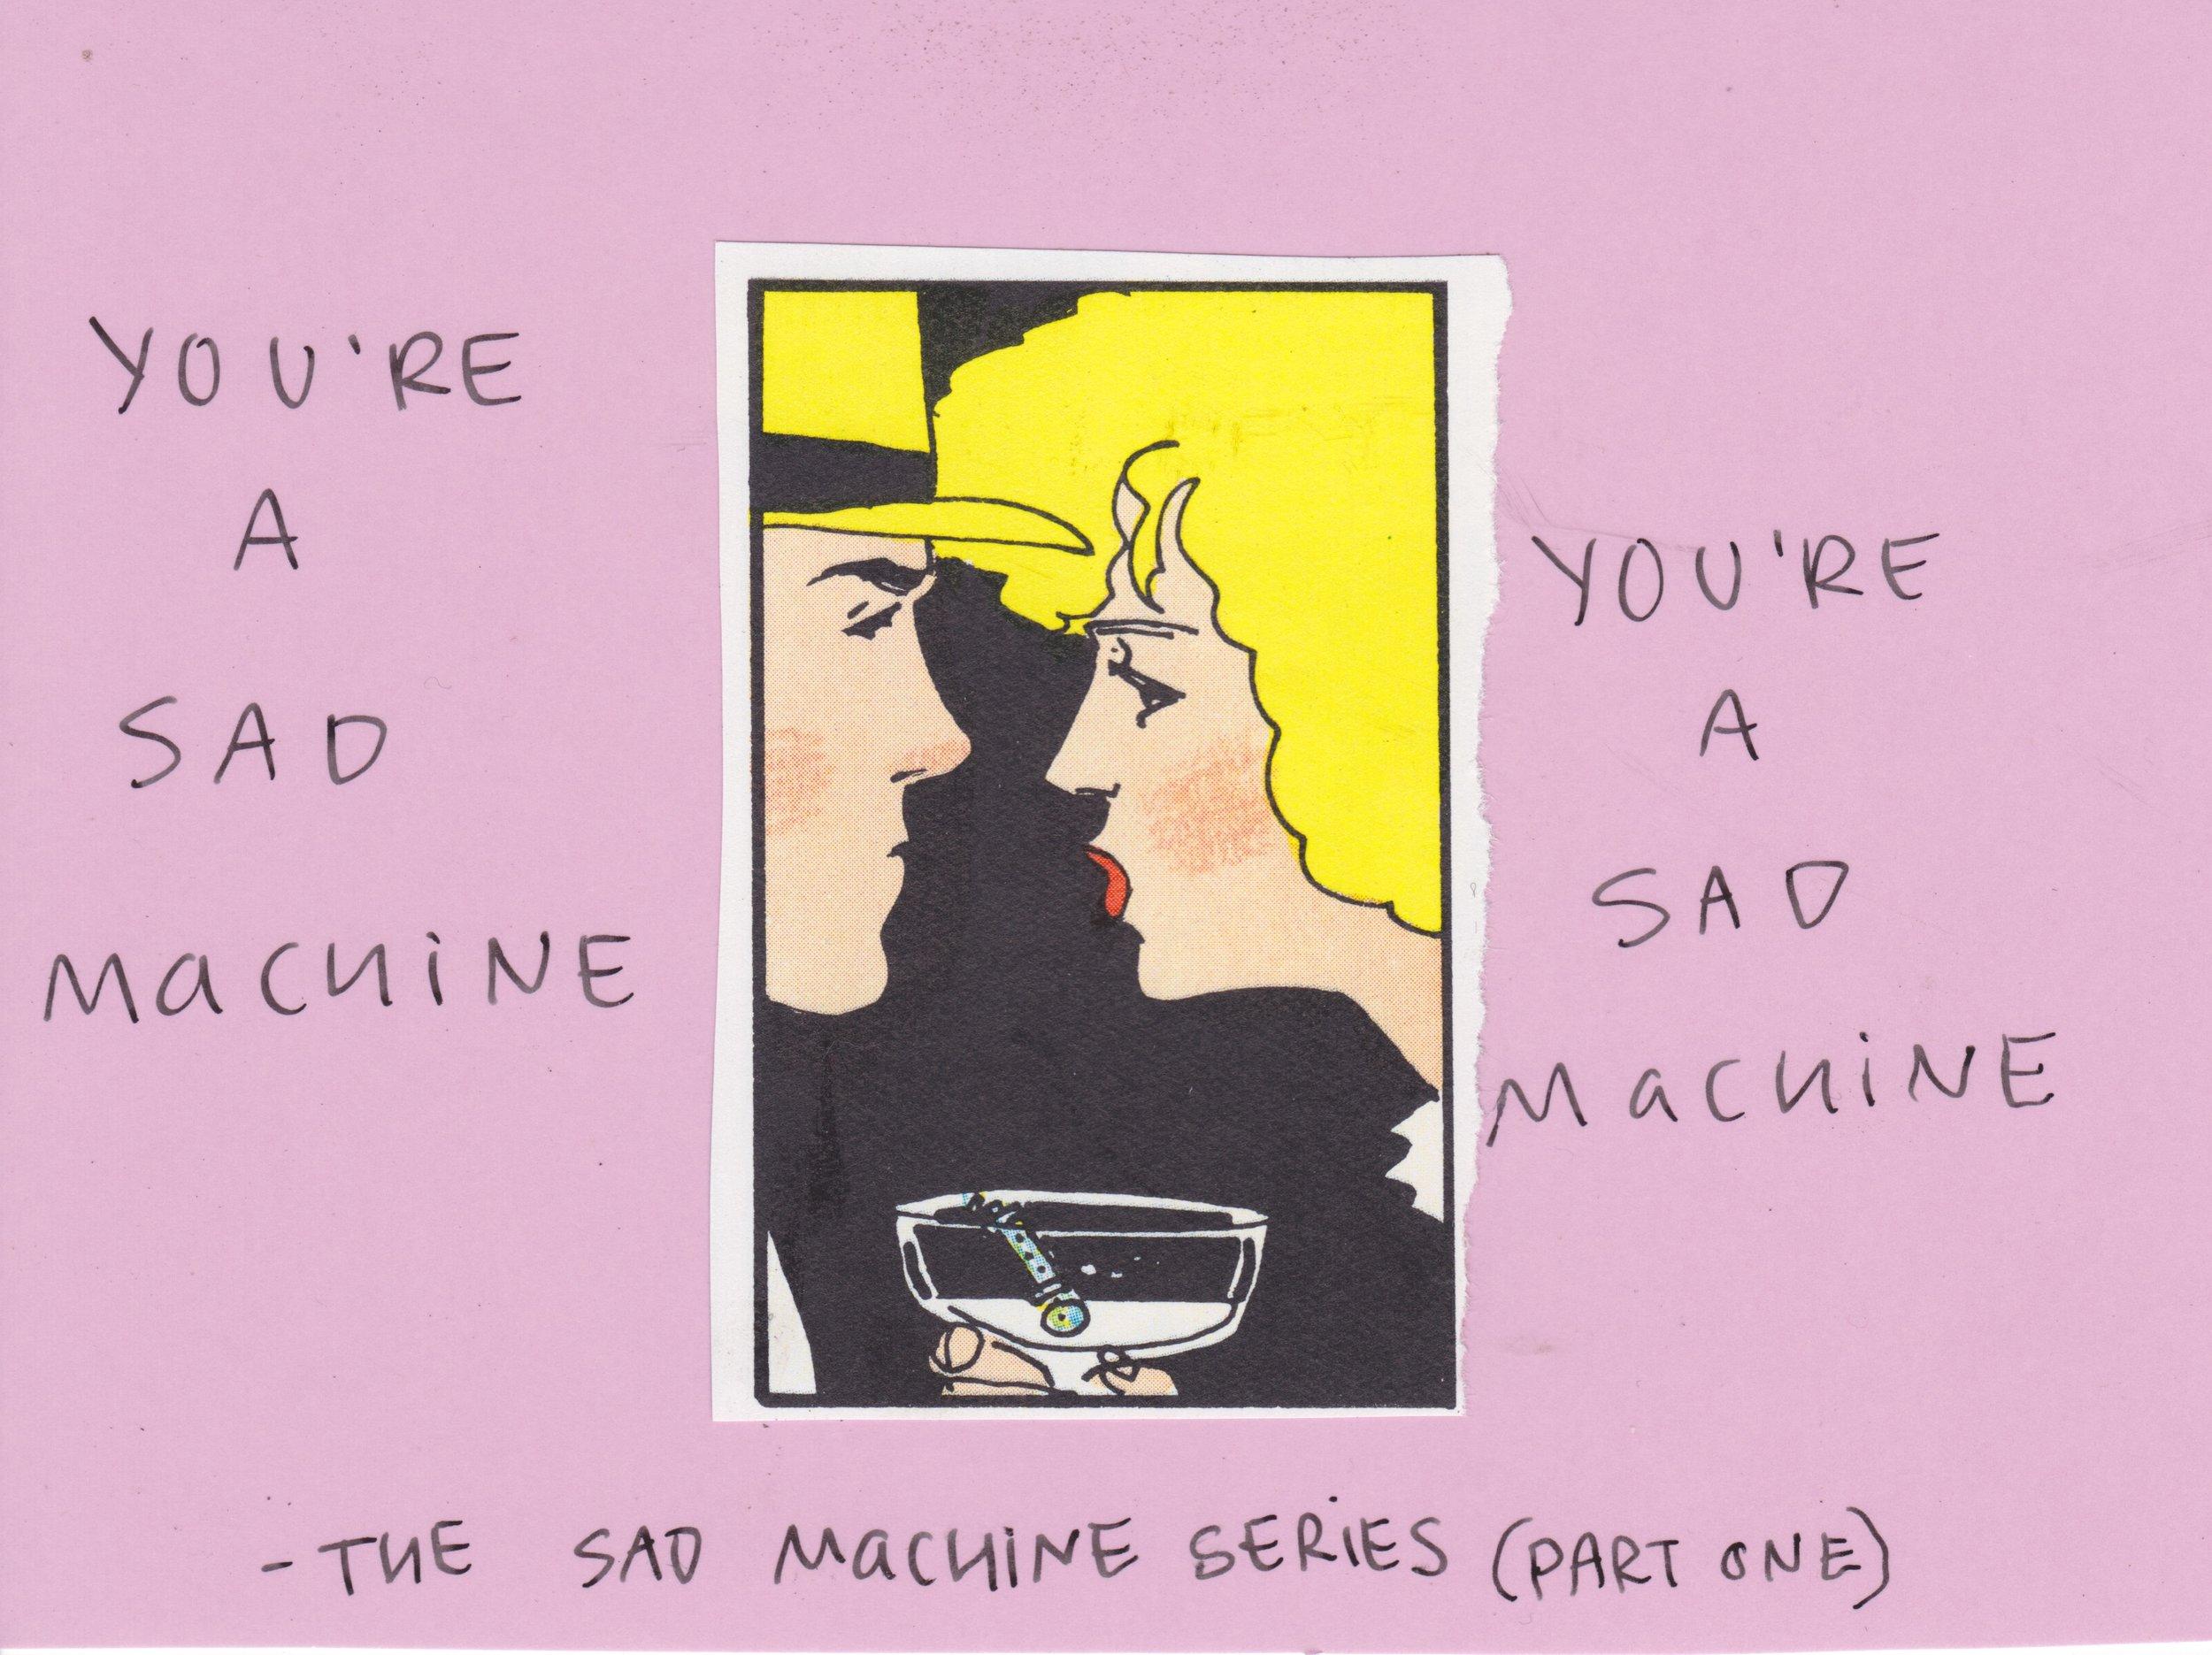 Sad Machine Series Quotes 3.jpeg